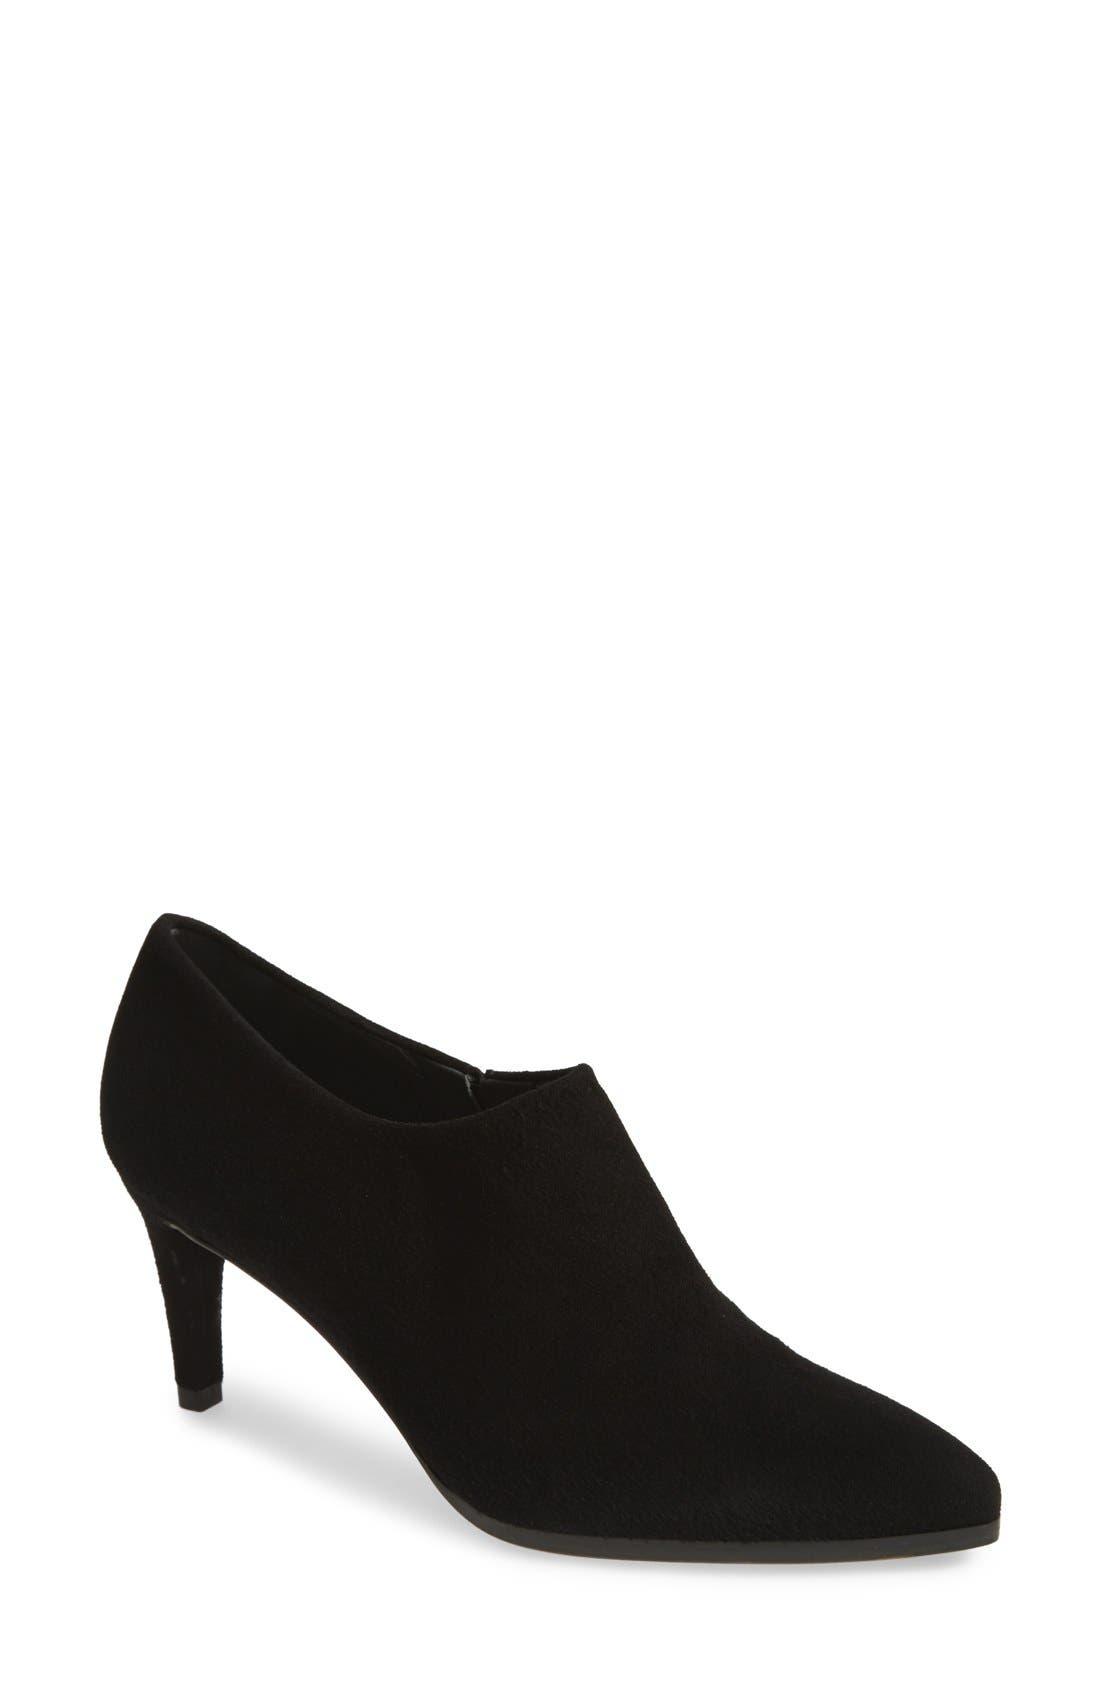 Main Image - Stuart Weitzman 'Standin' Leather Ankle Bootie (Women)